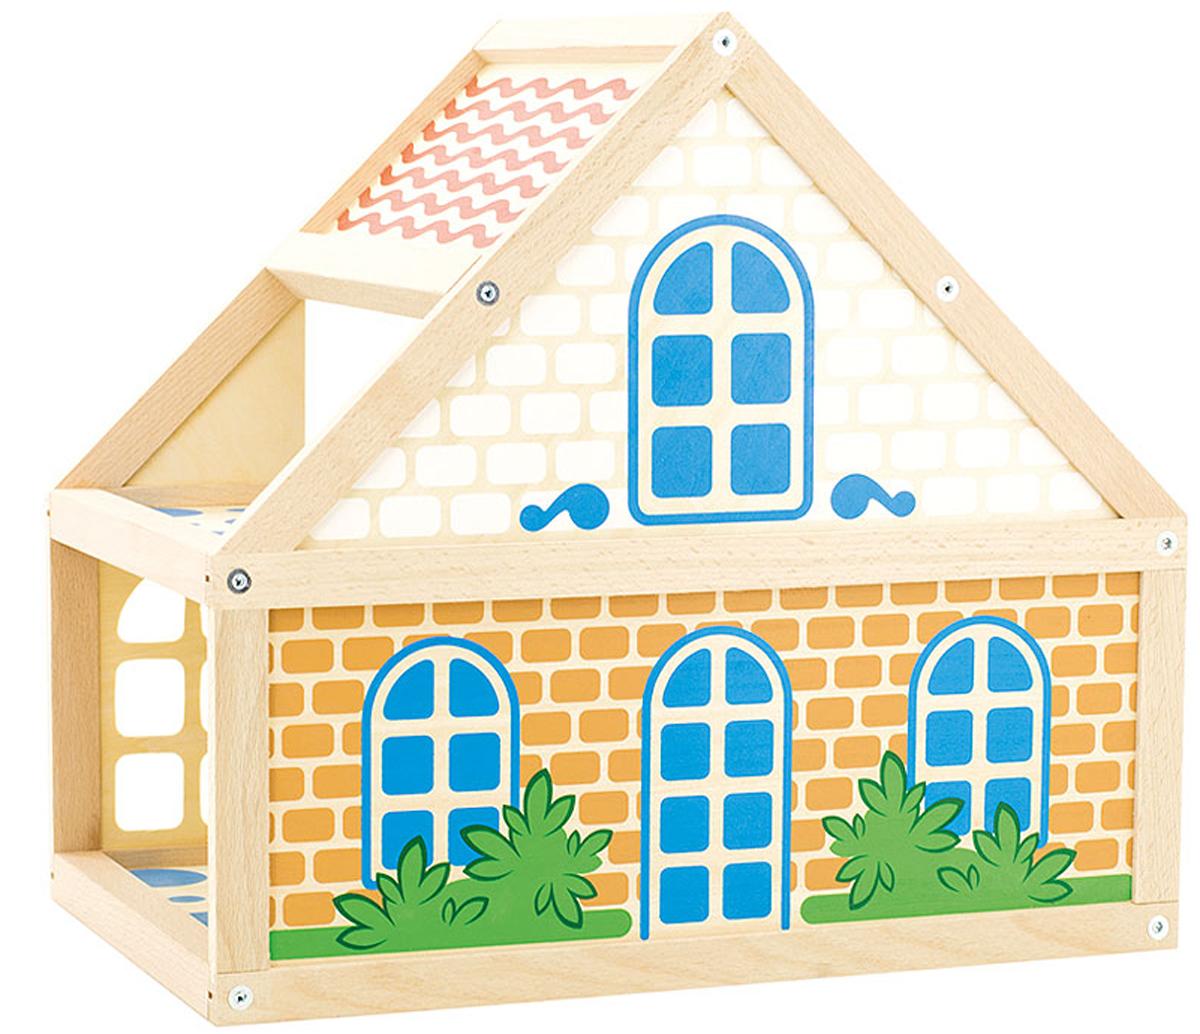 Игрушки из дерева Кукольный дом дом кукольный из дерева